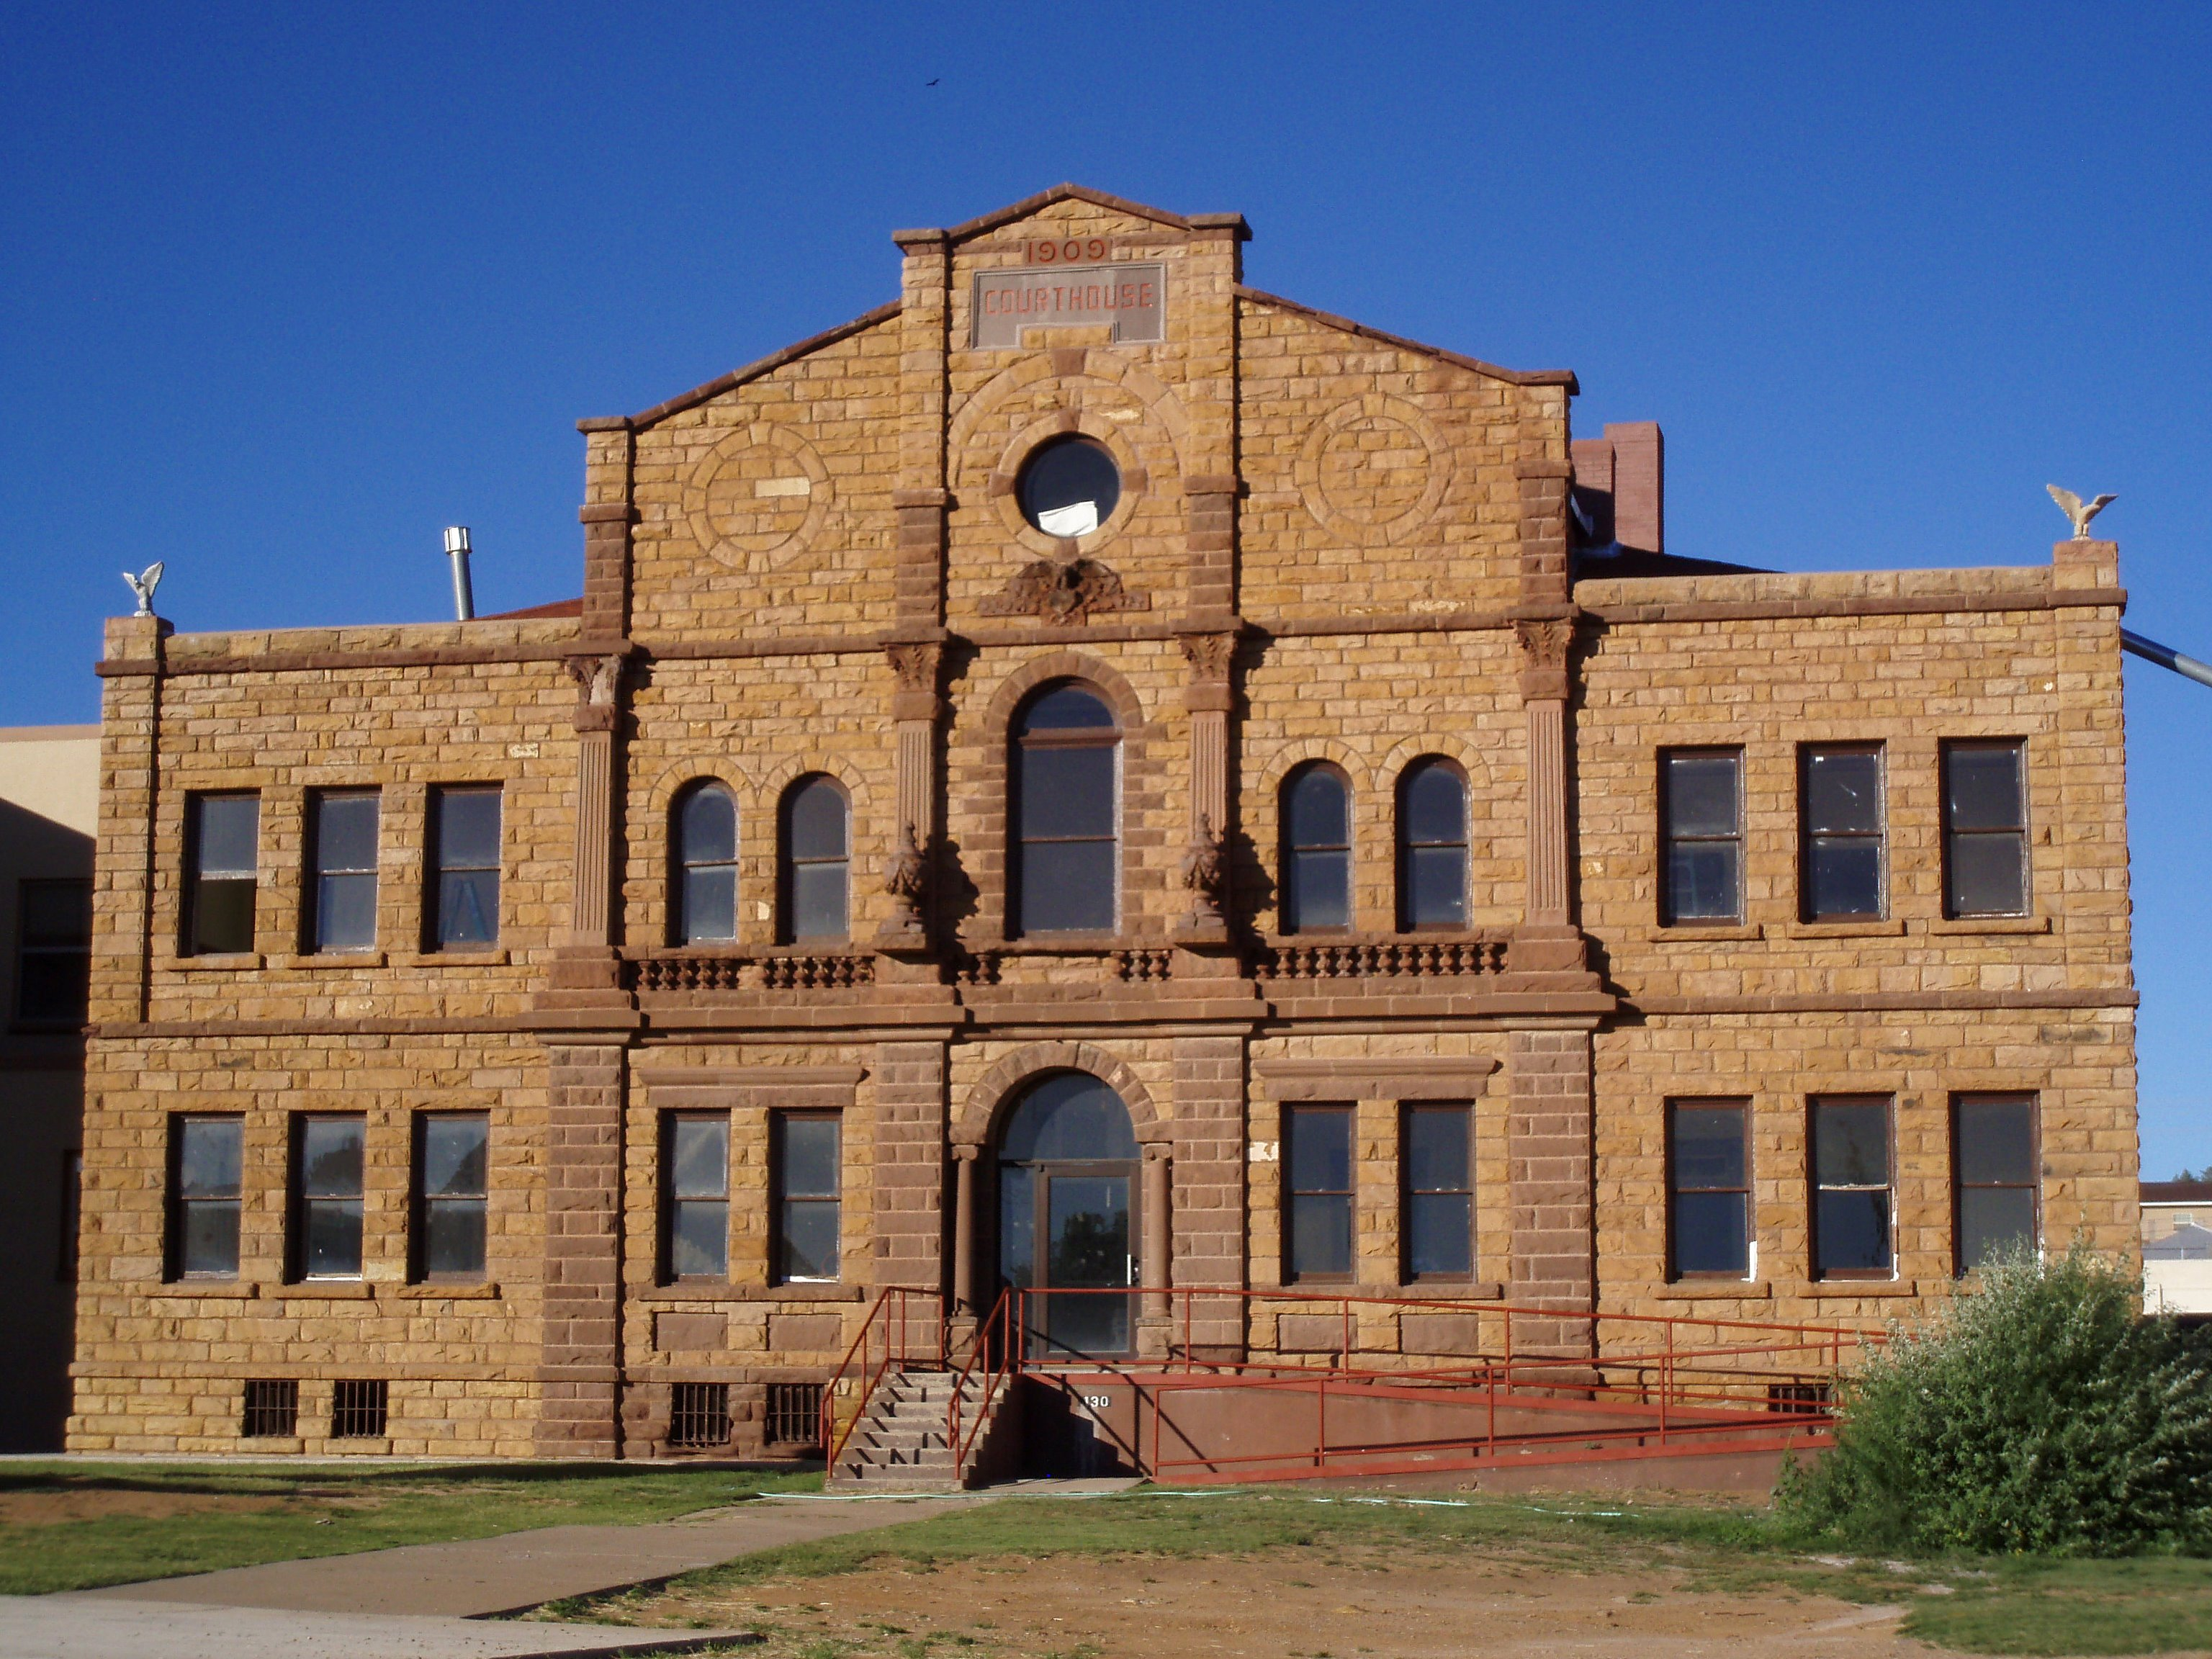 New mexico guadalupe county santa rosa - File Santa Rosa Courthouse Jpg